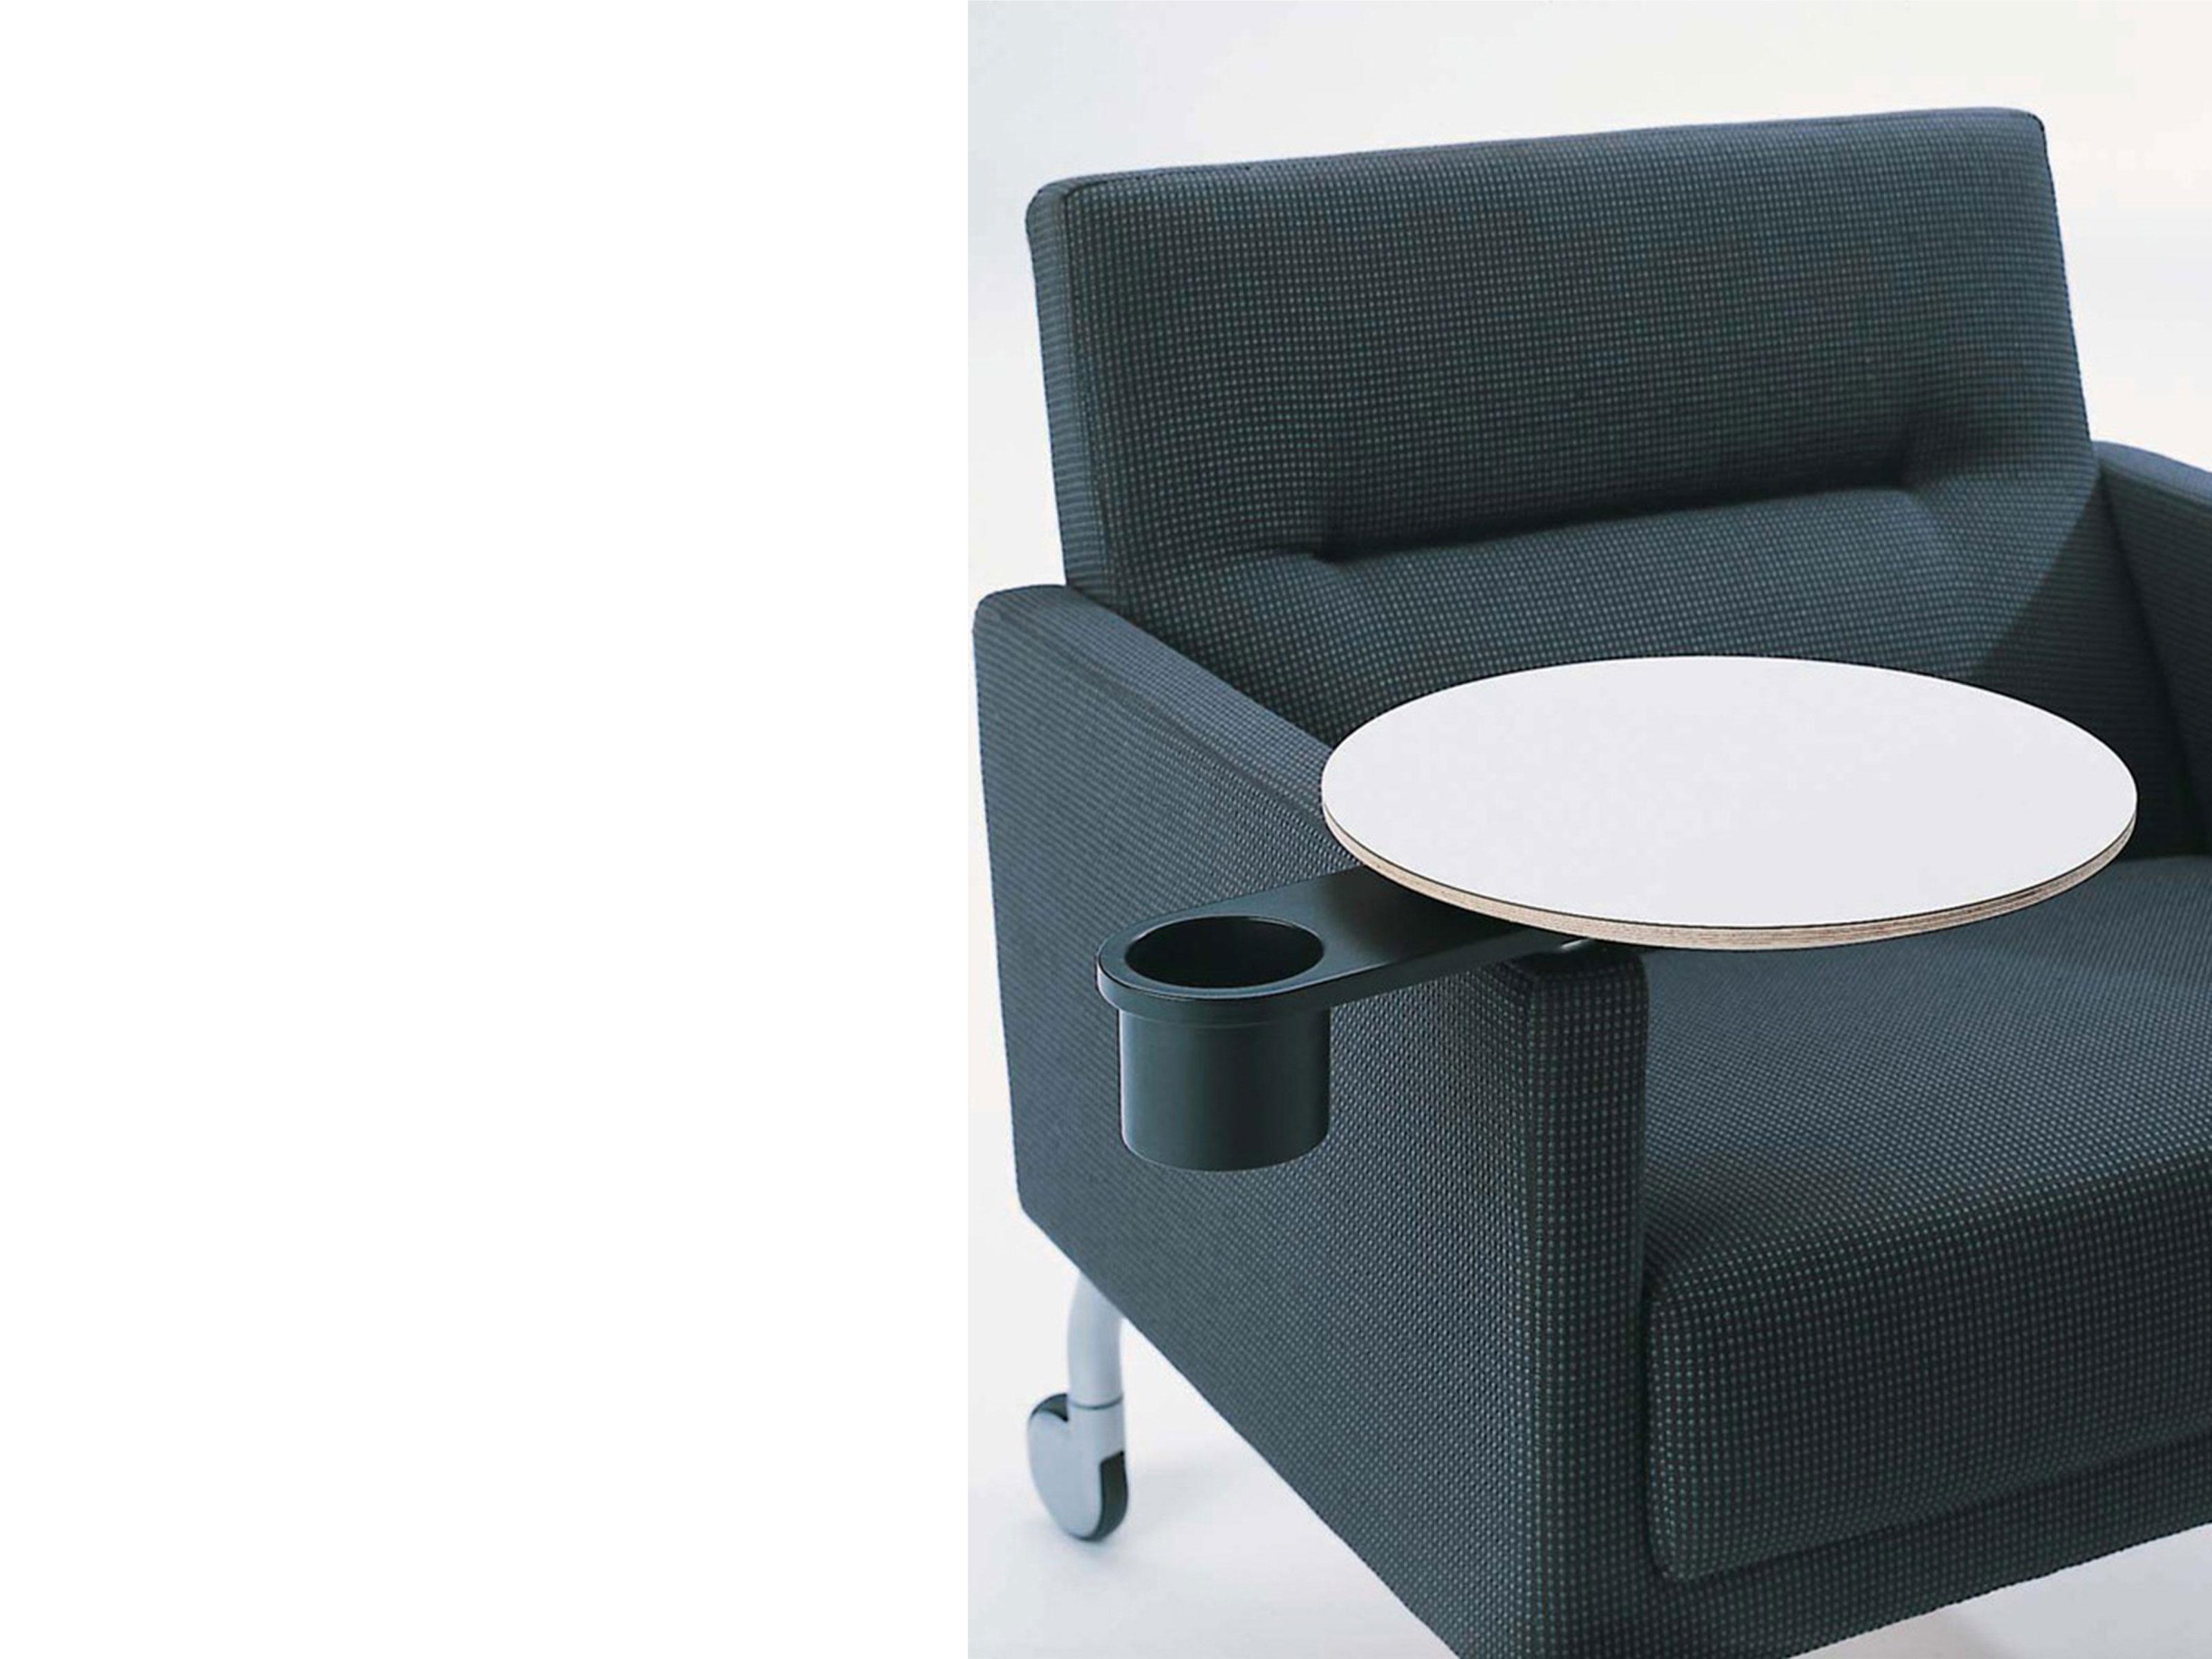 Sensational Coalesse Sidewalk Lounge Portable Seating Steelcase Inzonedesignstudio Interior Chair Design Inzonedesignstudiocom